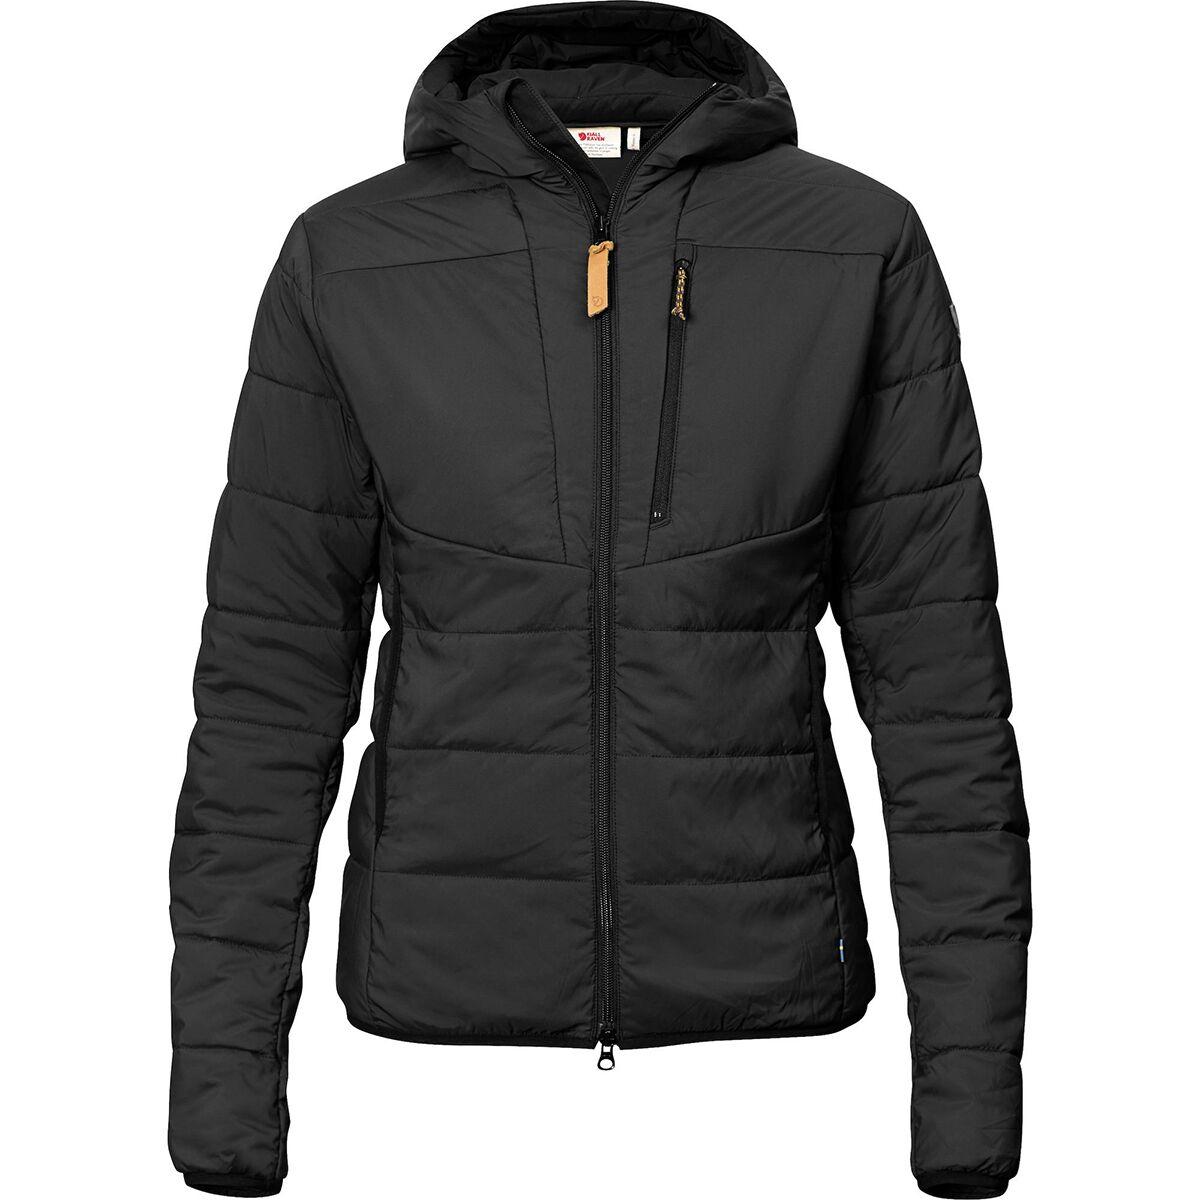 Fjallraven Keb Loft Insulated Hooded Jacket - Women